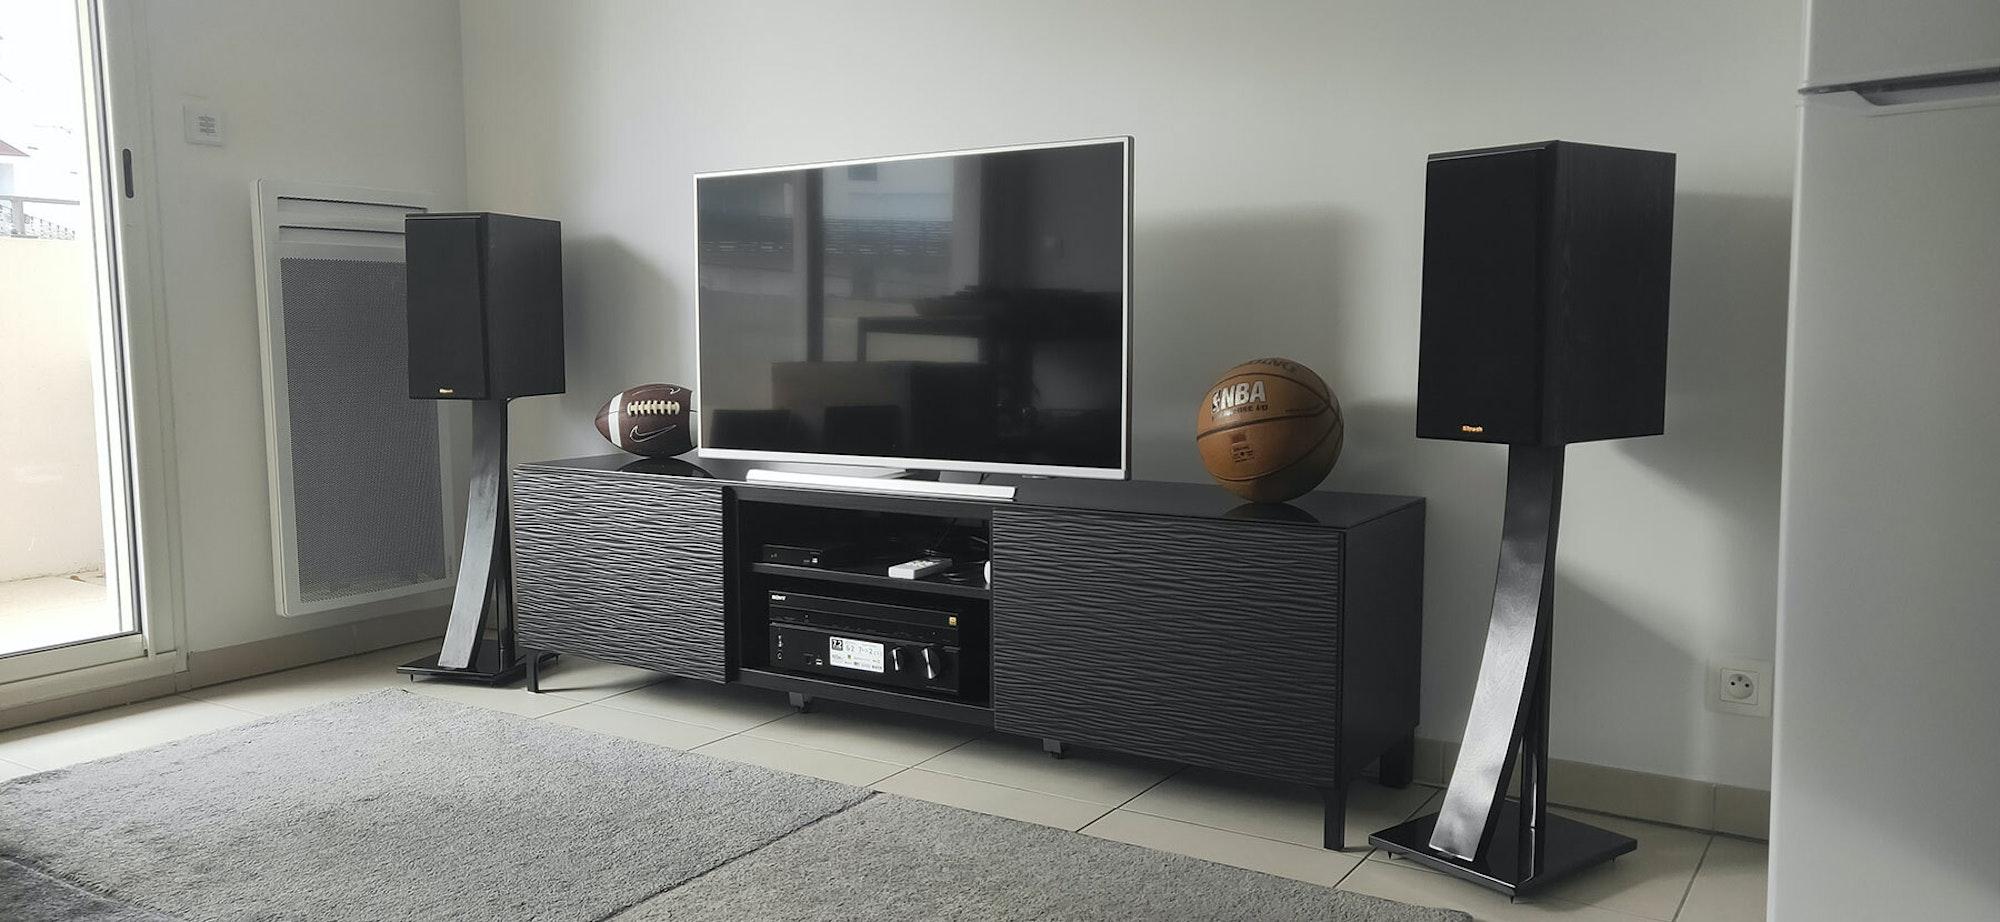 RP 600 M bookshelf speaker home theater setup with basketball